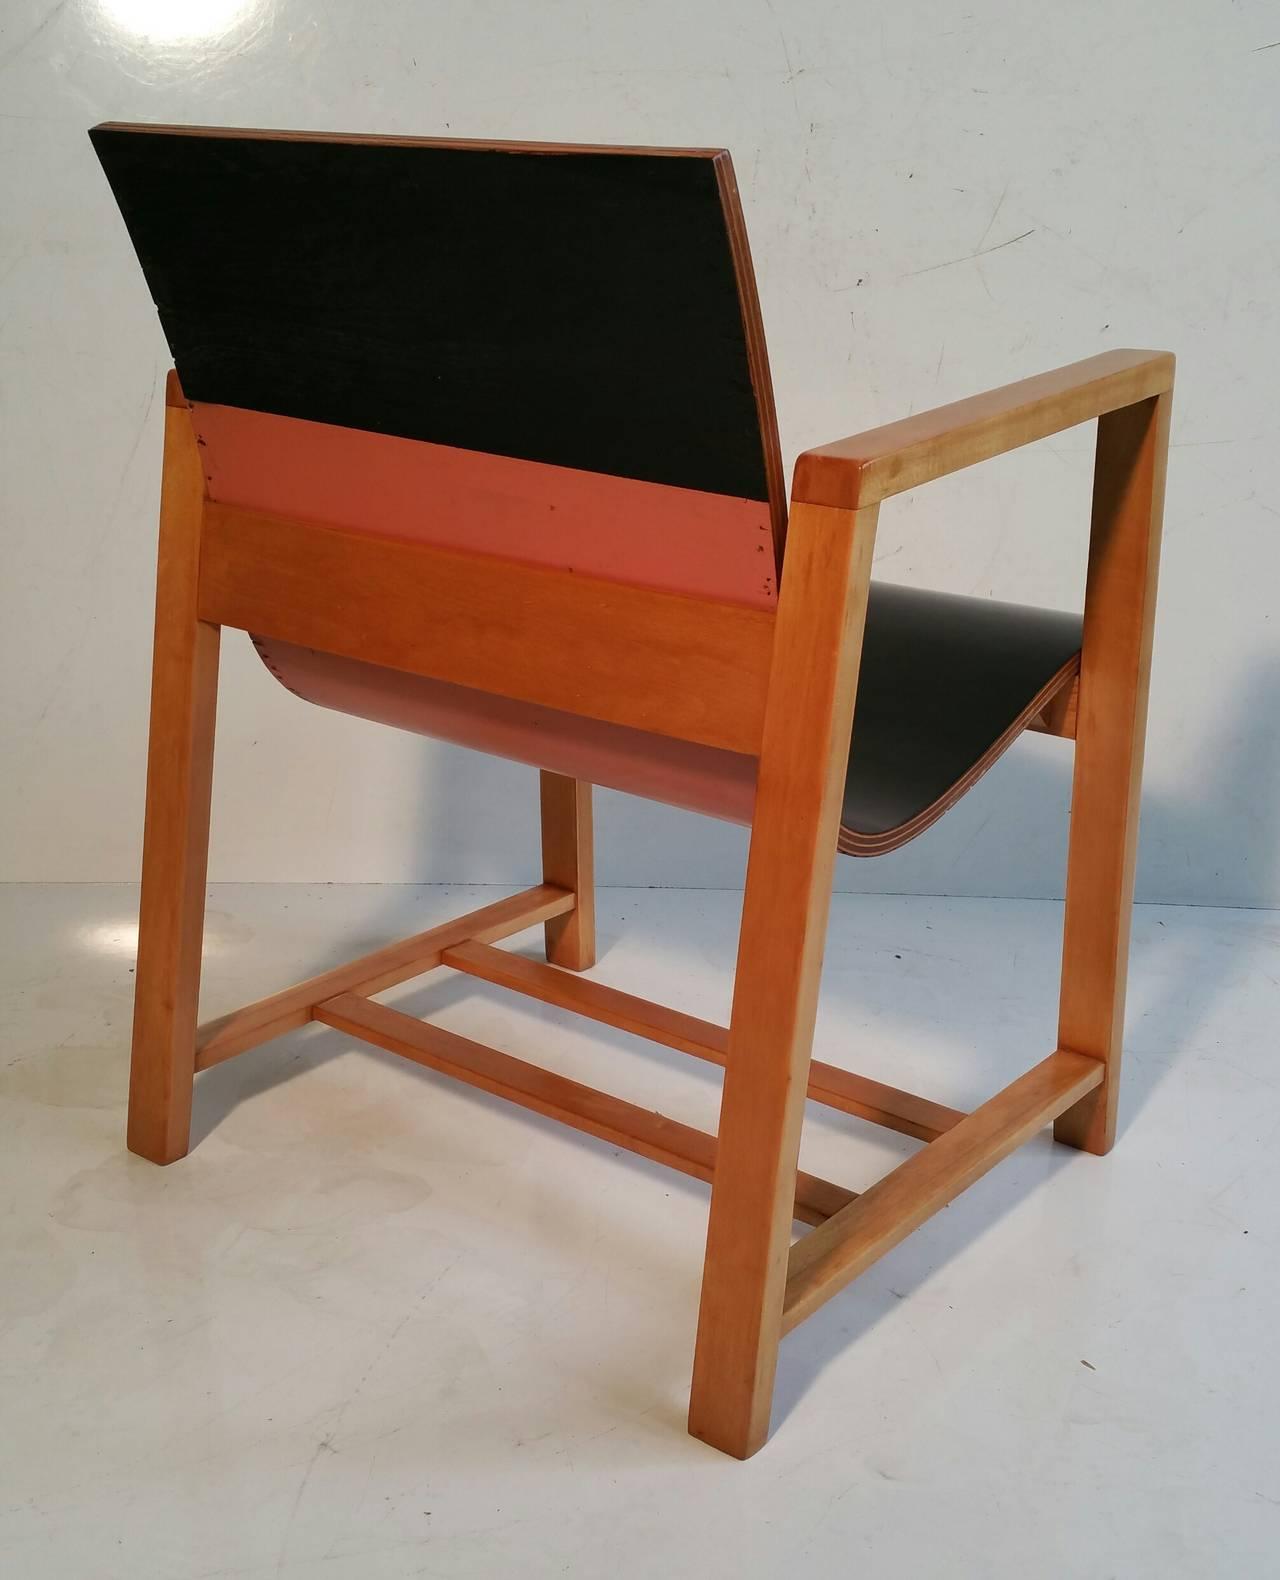 Rare Quot Kleinhans Quot Chair C 1939 Charles Eames Eero